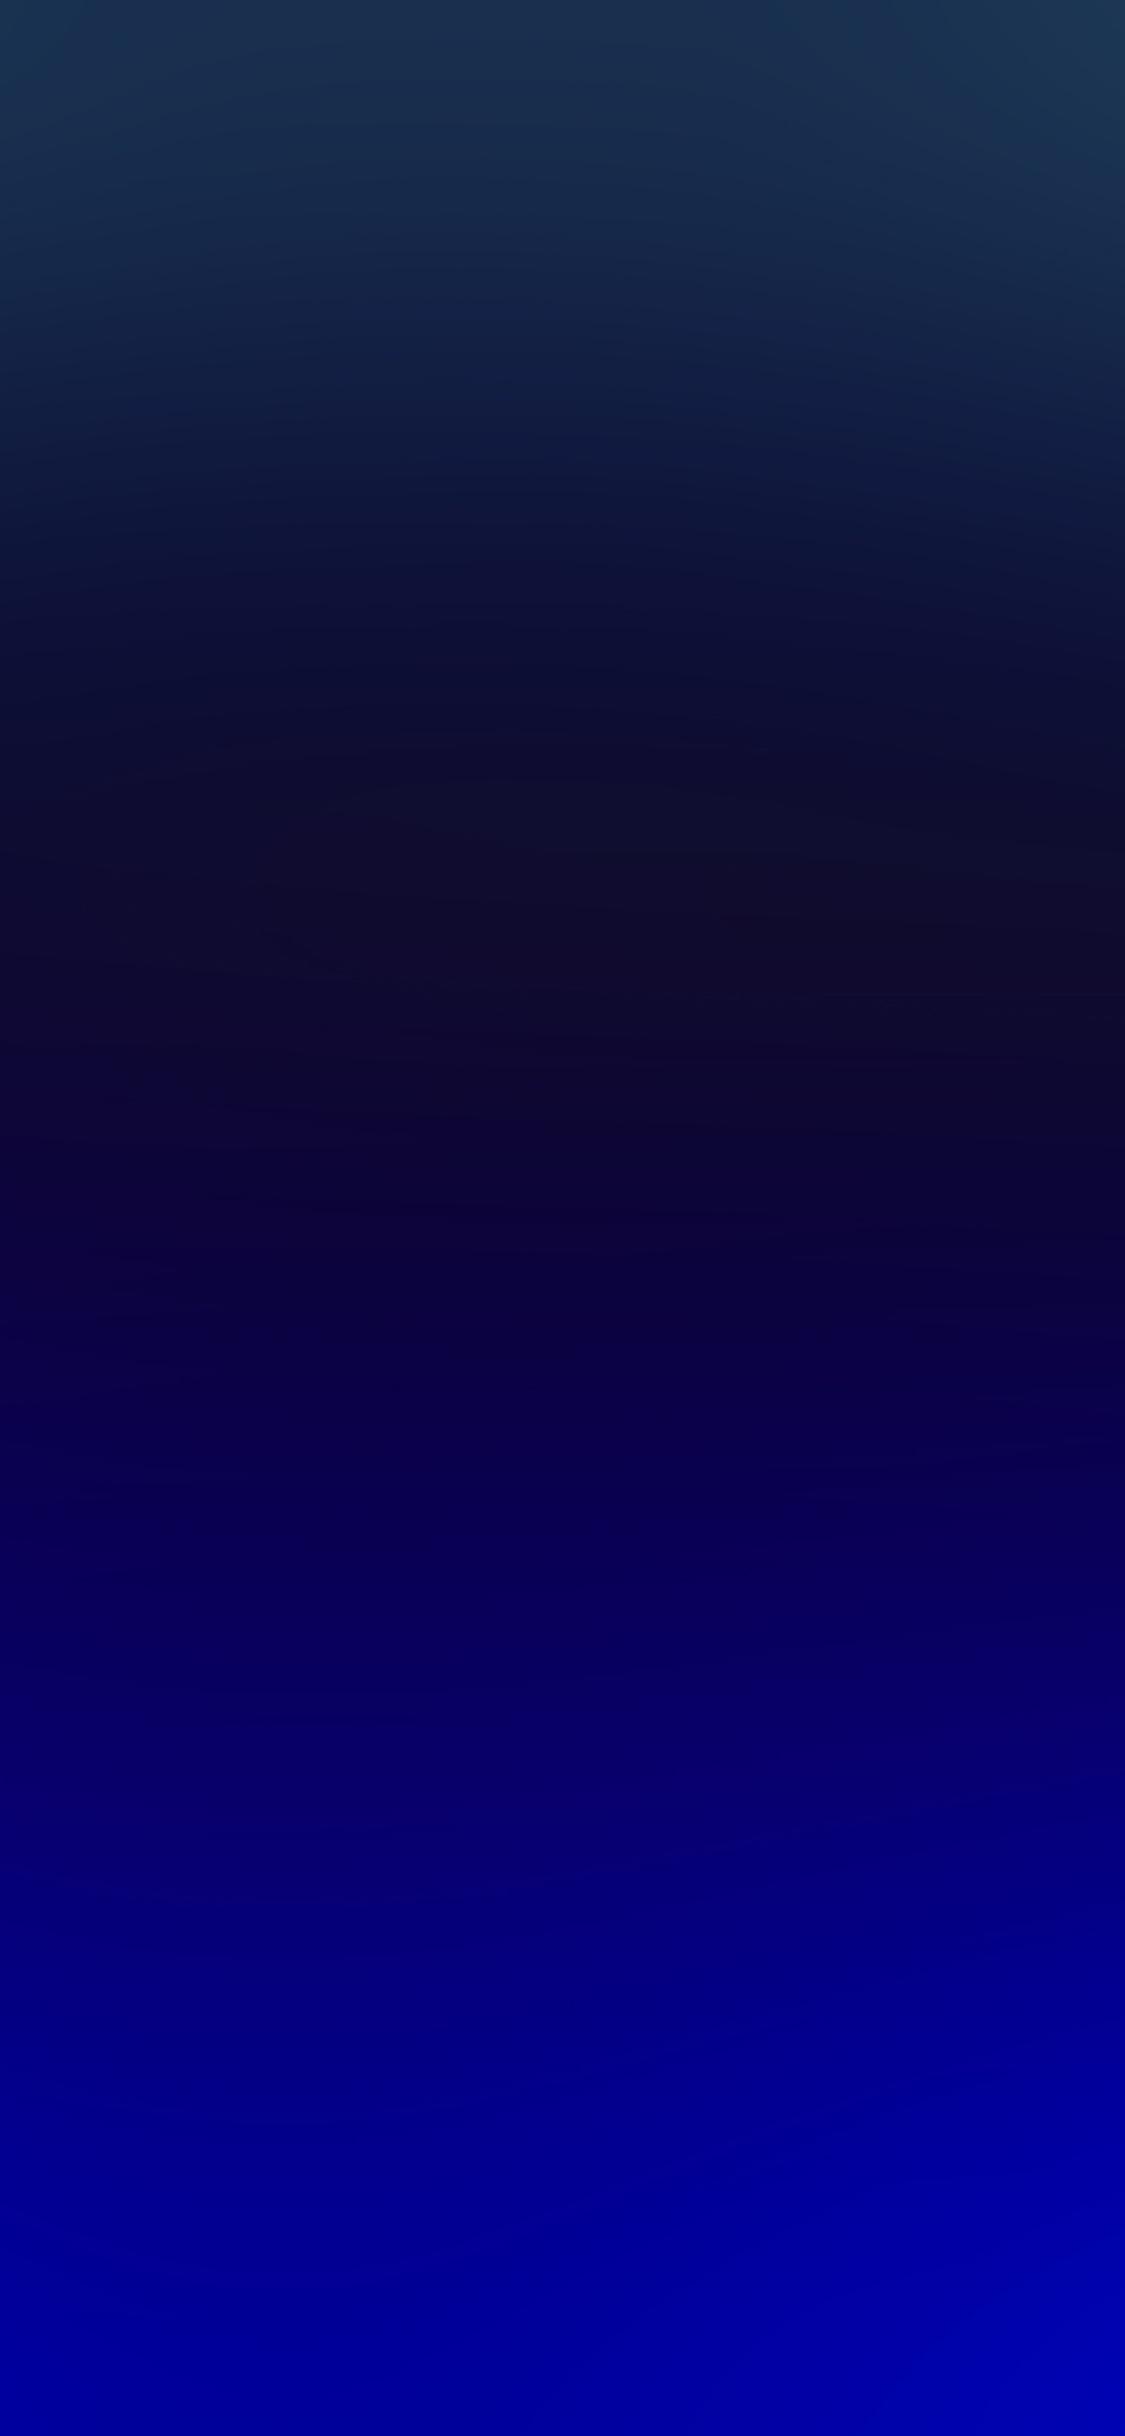 iPhoneXpapers.com-Apple-iPhone-wallpaper-sb27-wallpaper-blue-foundation-blur